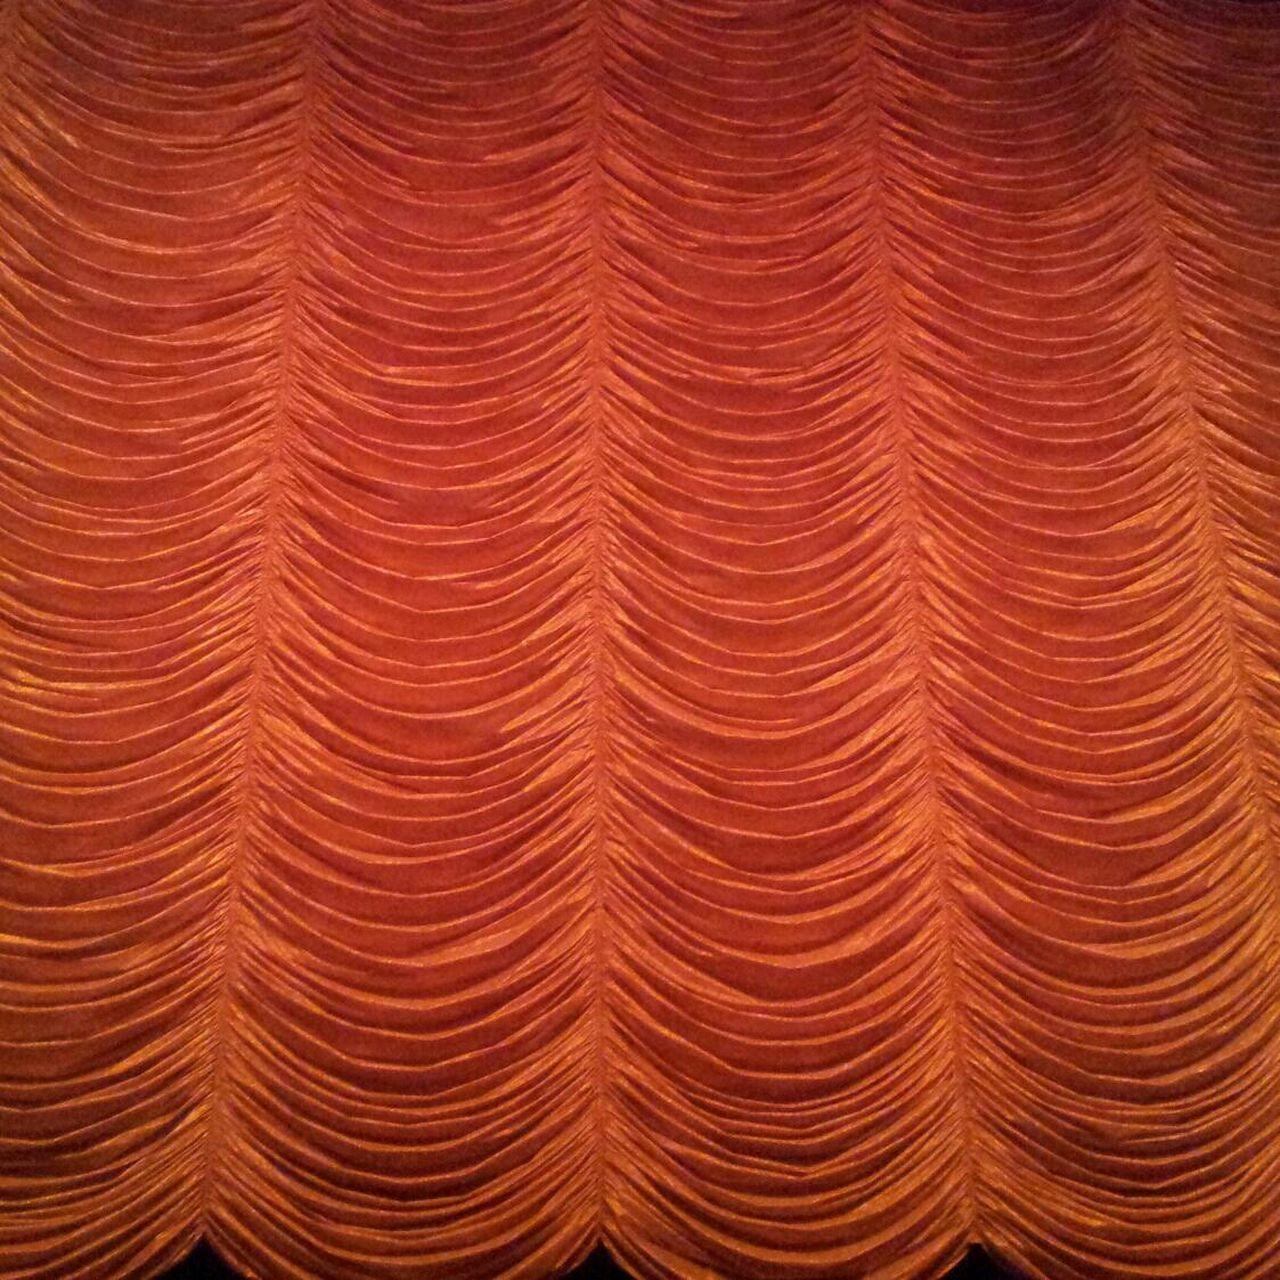 Goldener Vorhang Anticipation Berlinale 2014 Curtain Shines